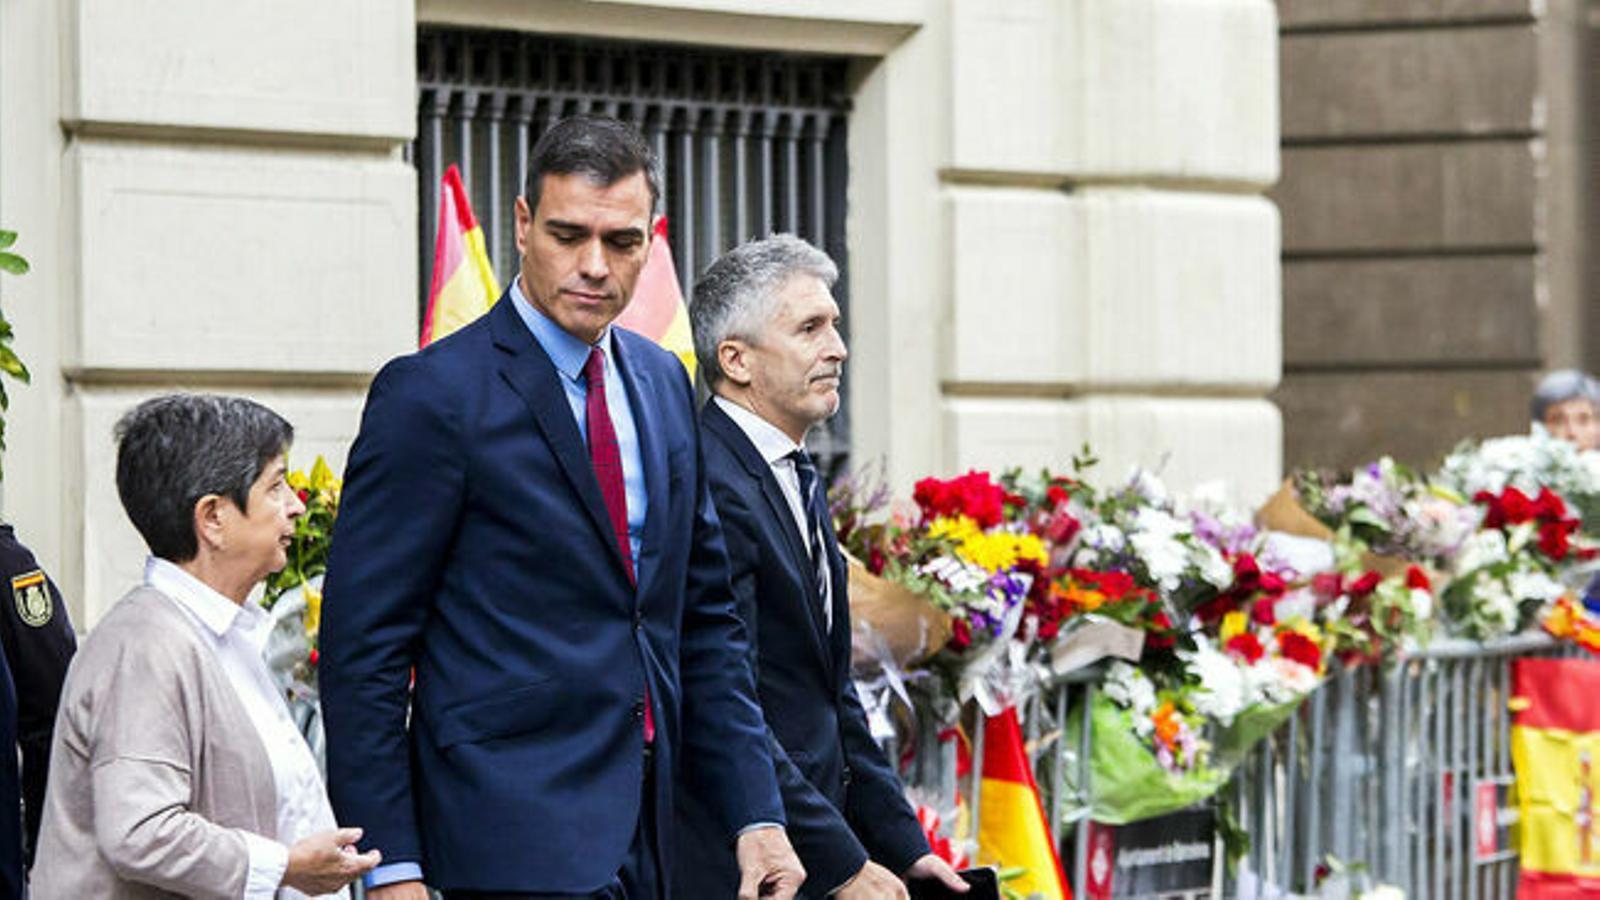 Sánchez ignora Torra tot i visitar Barcelona